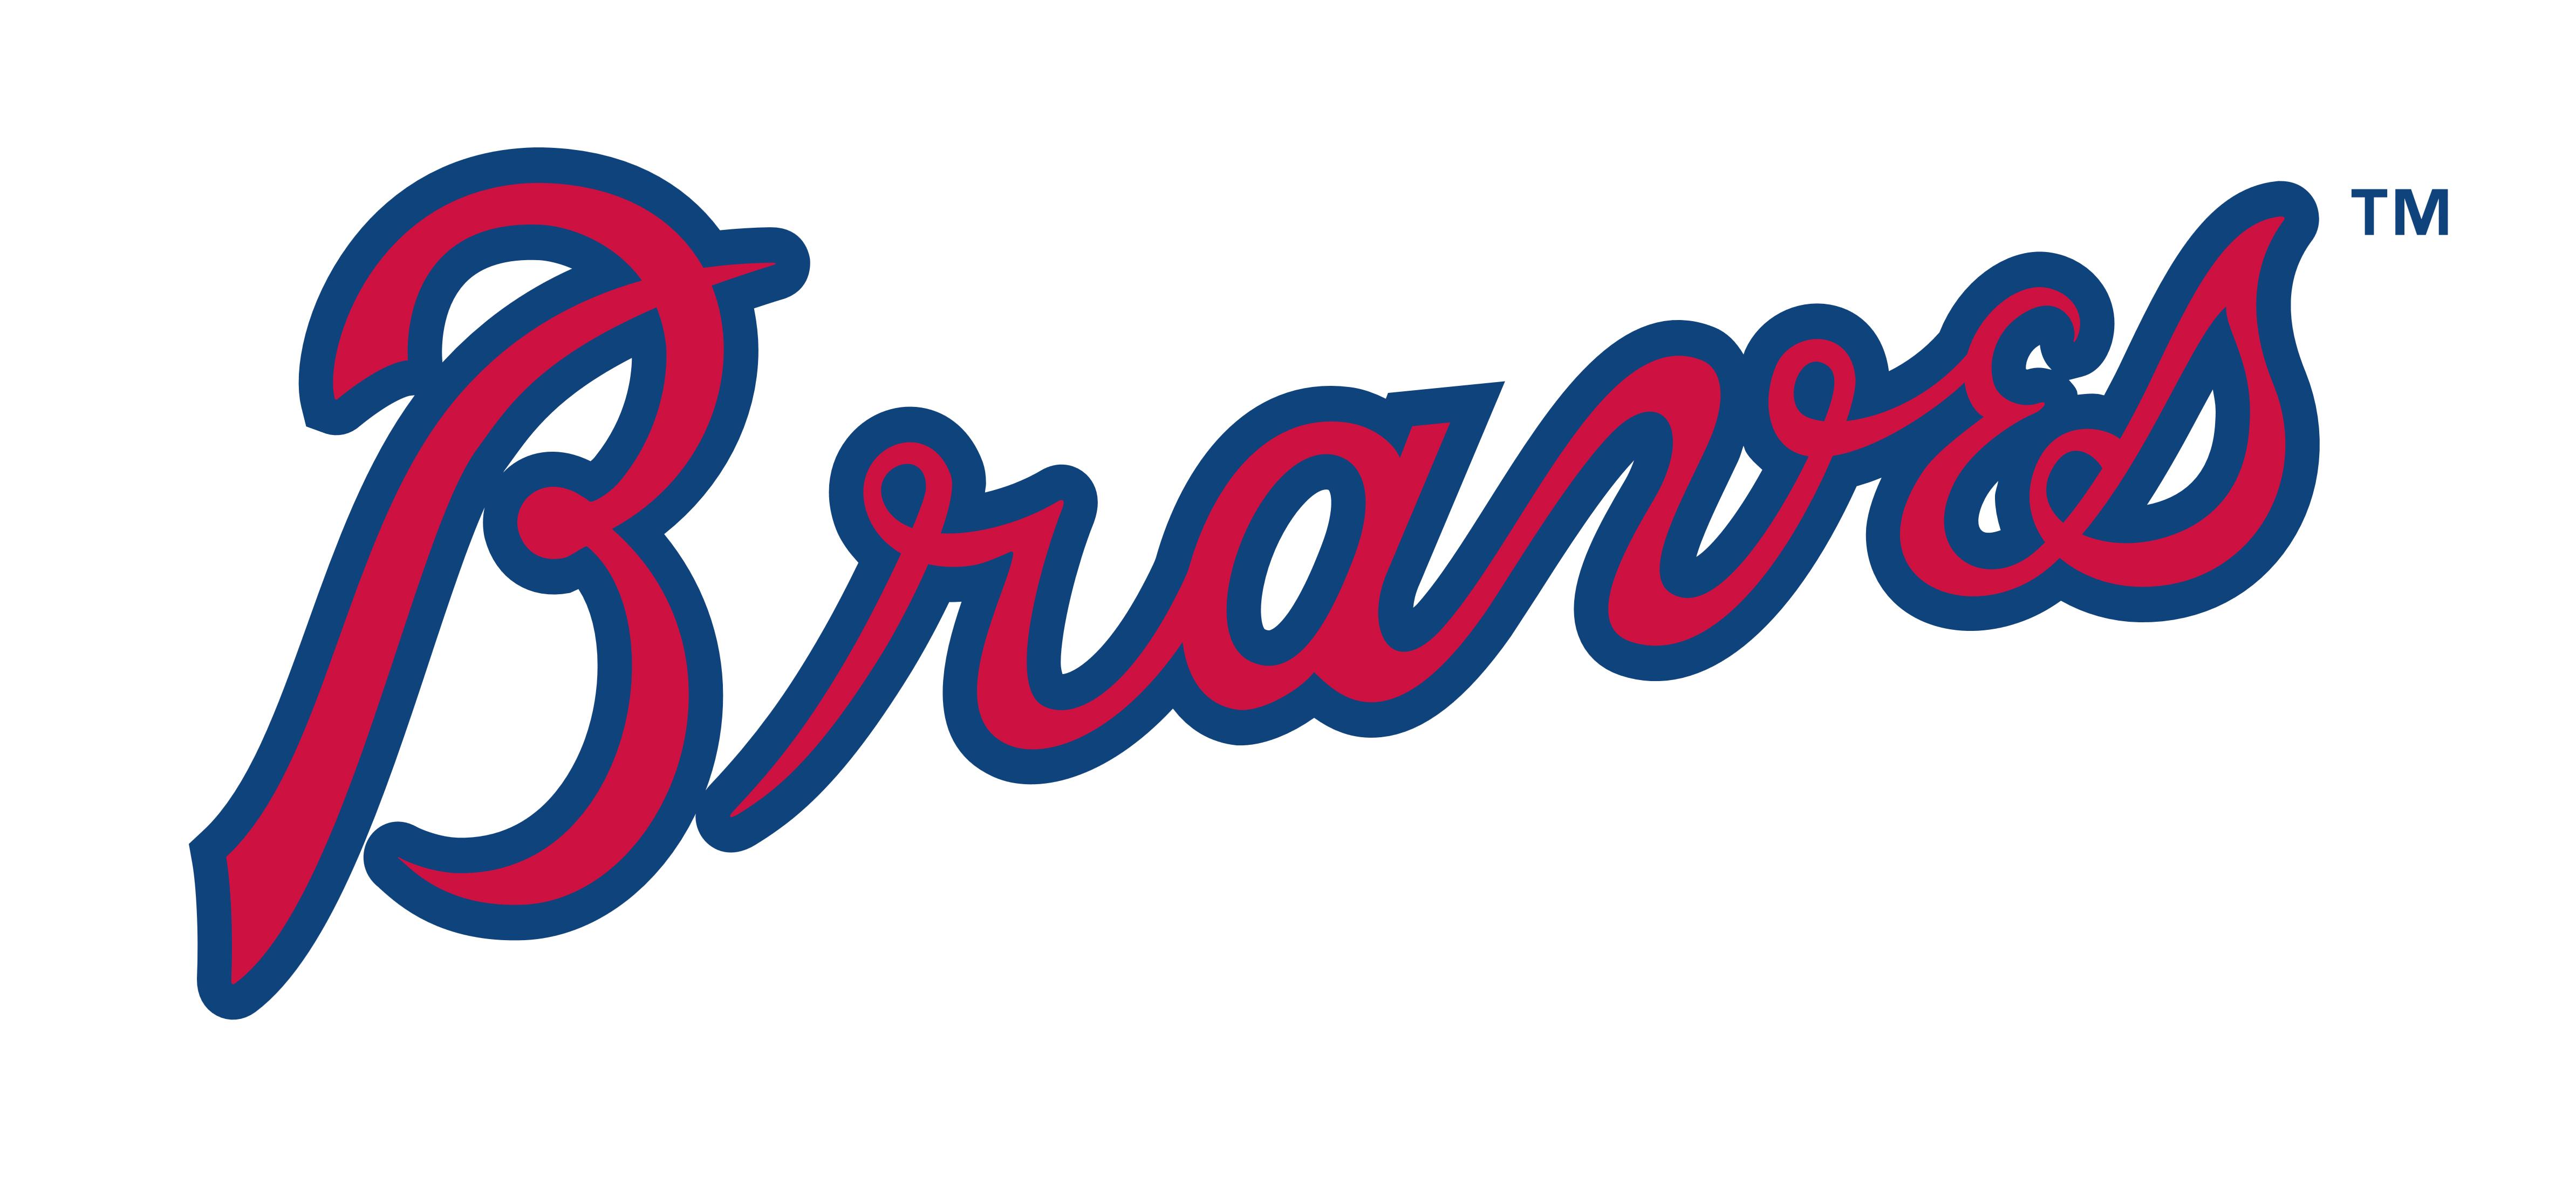 4775x2192 Atlanta Braves Logo, Atlanta Braves Symbol, Meaning, History